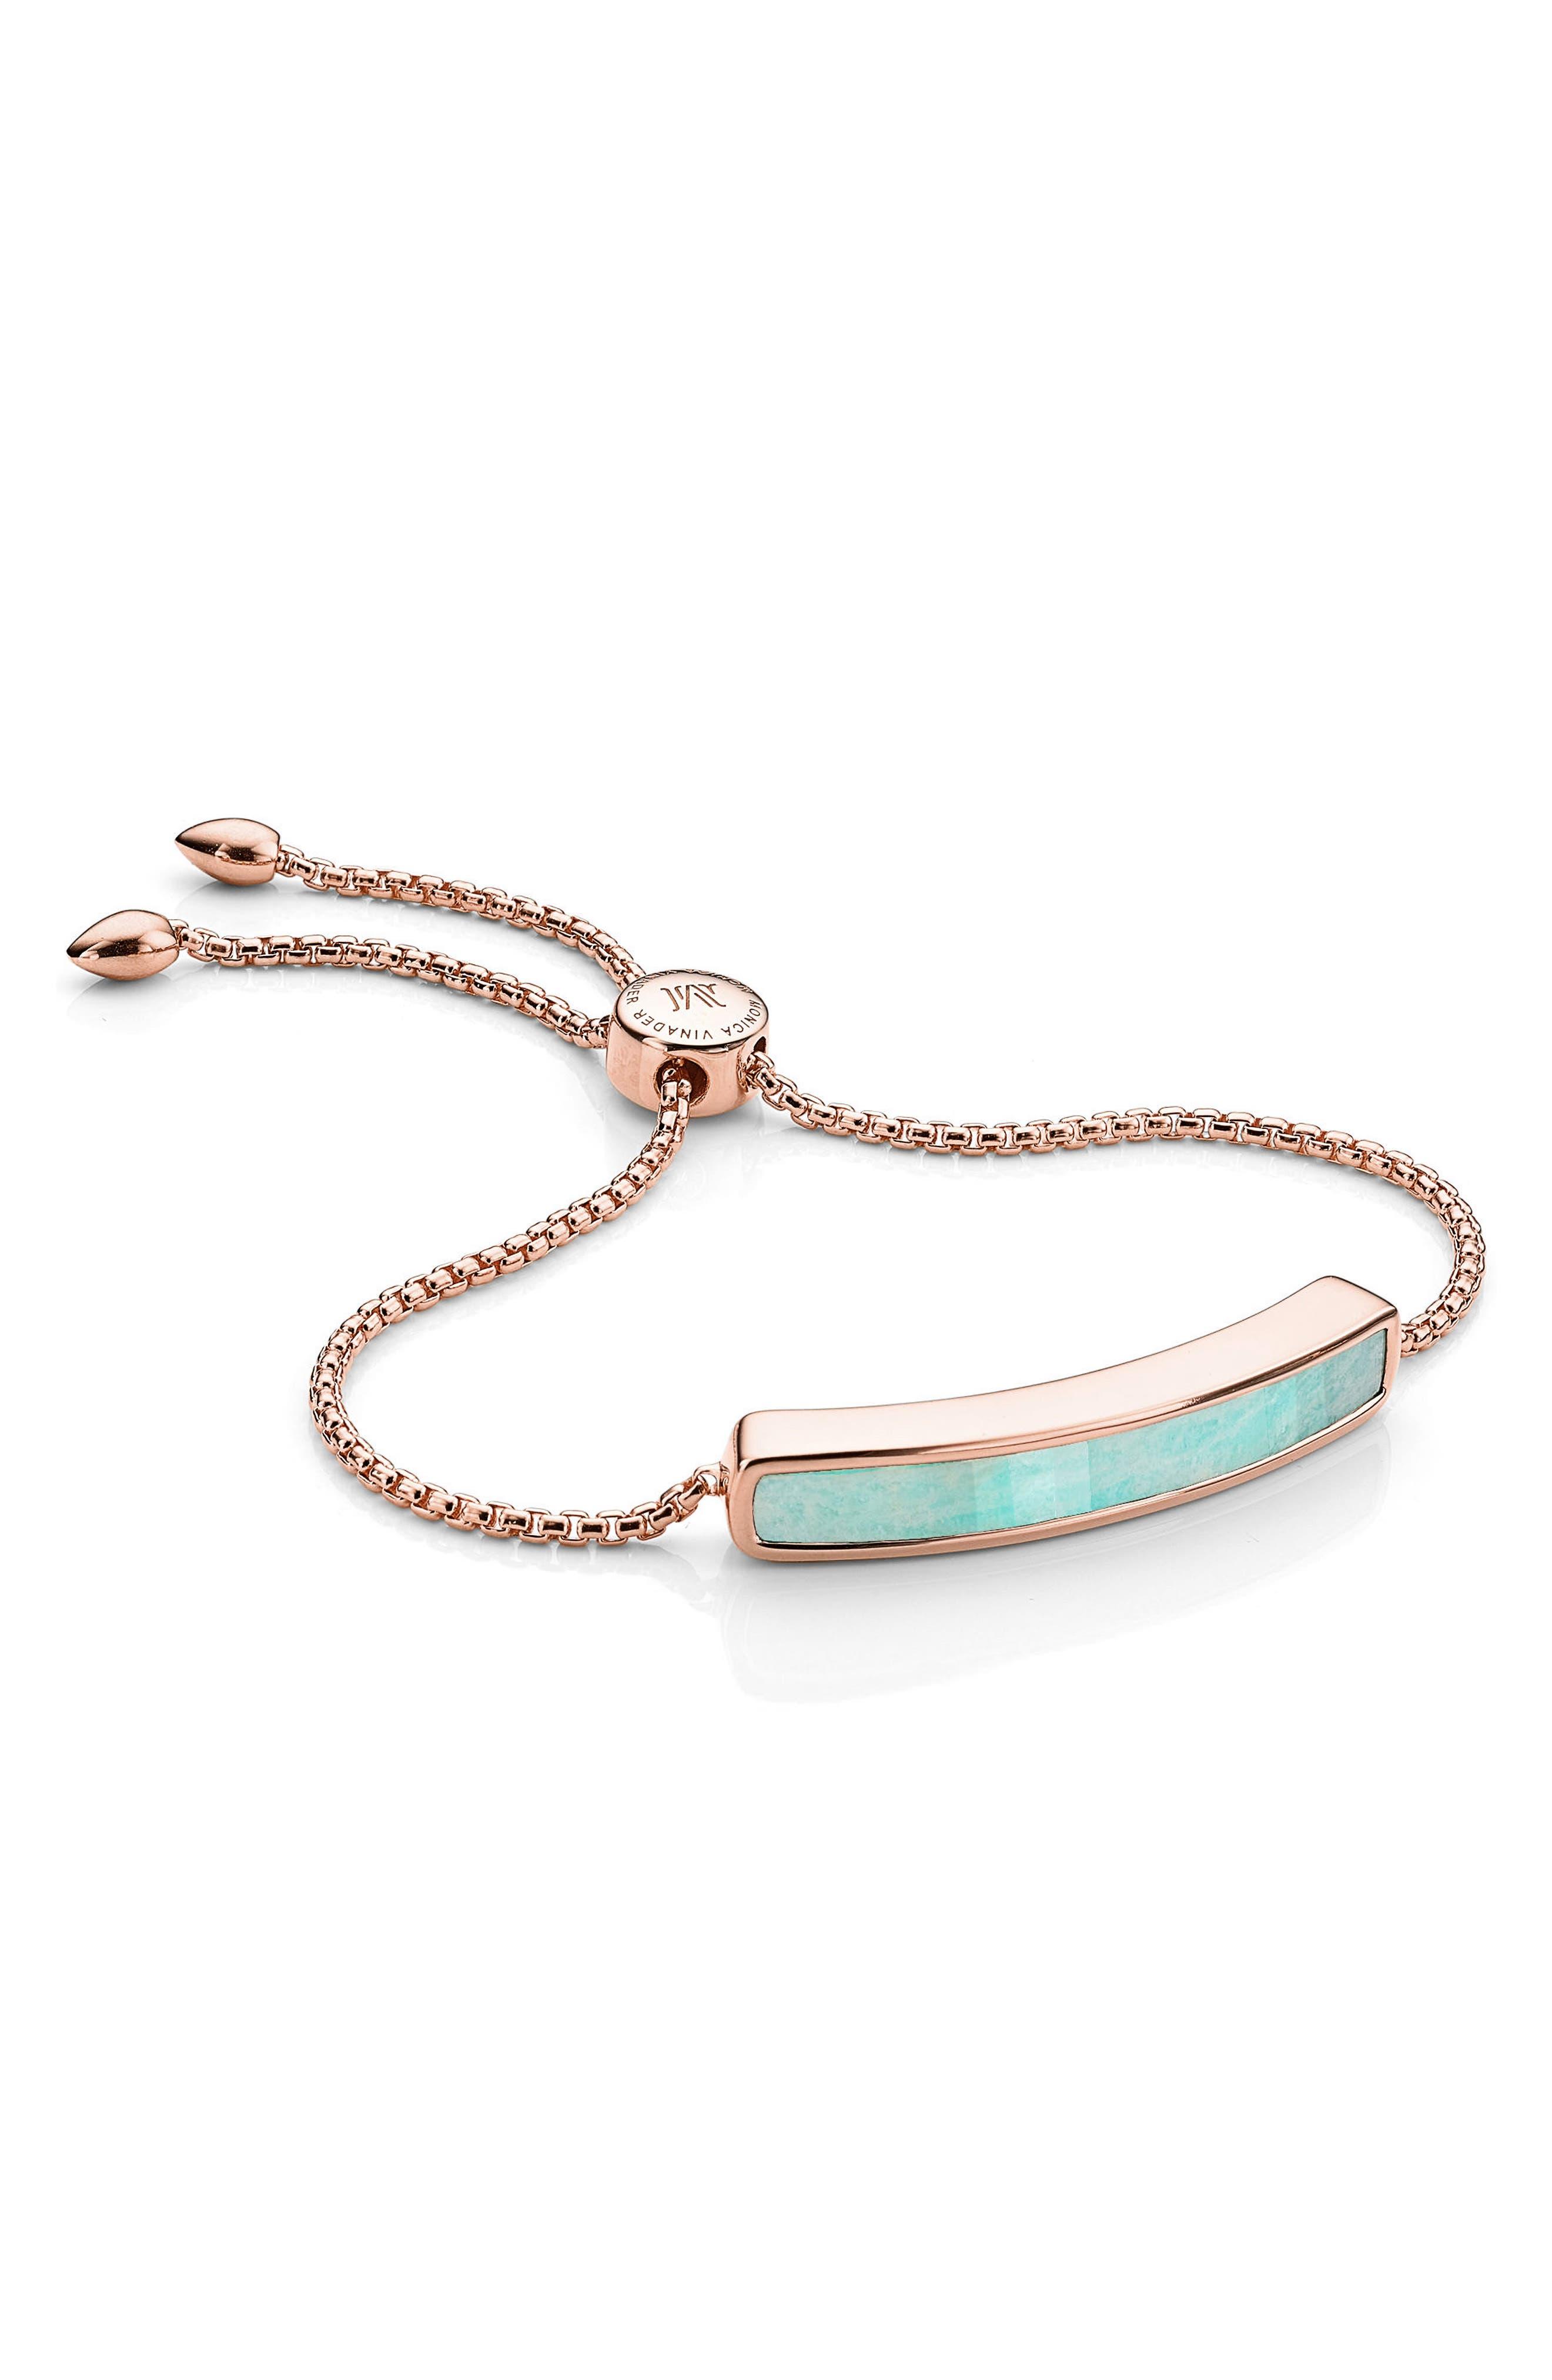 Monica Vinader Baja Stone Bracelet